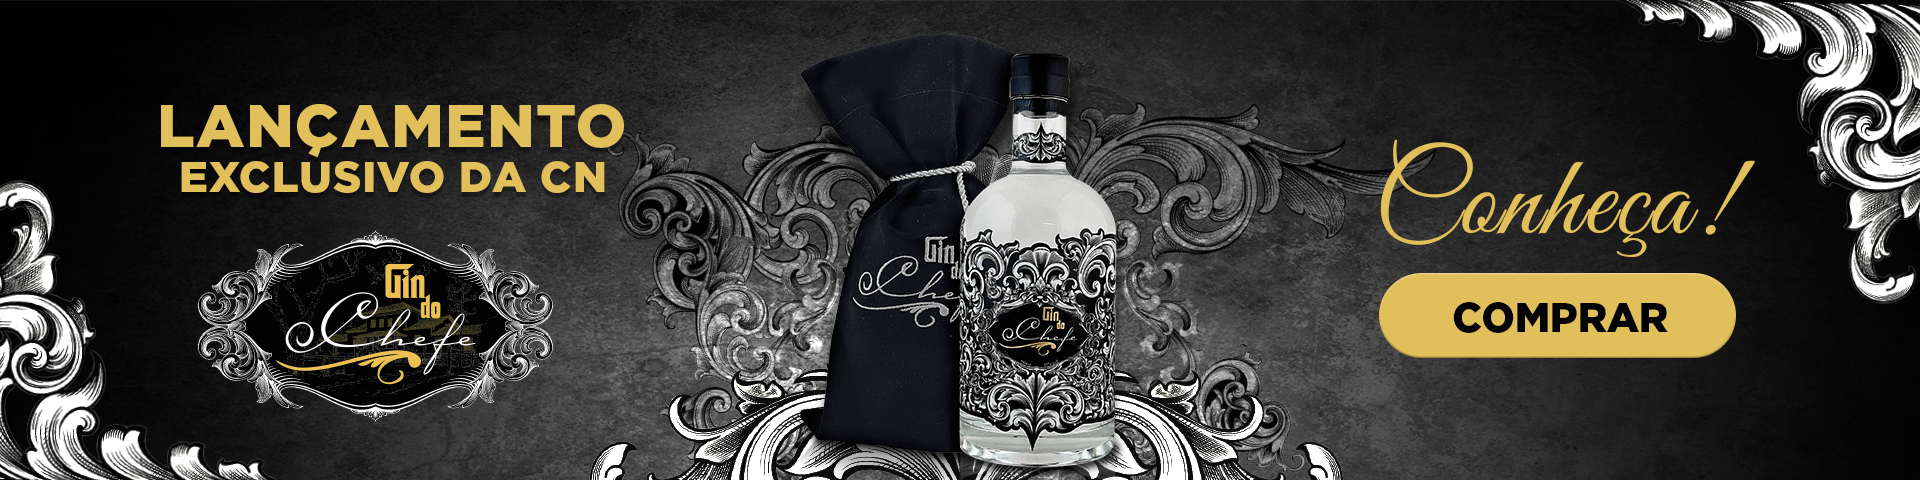 Gin do Chefe - Categoria Gin